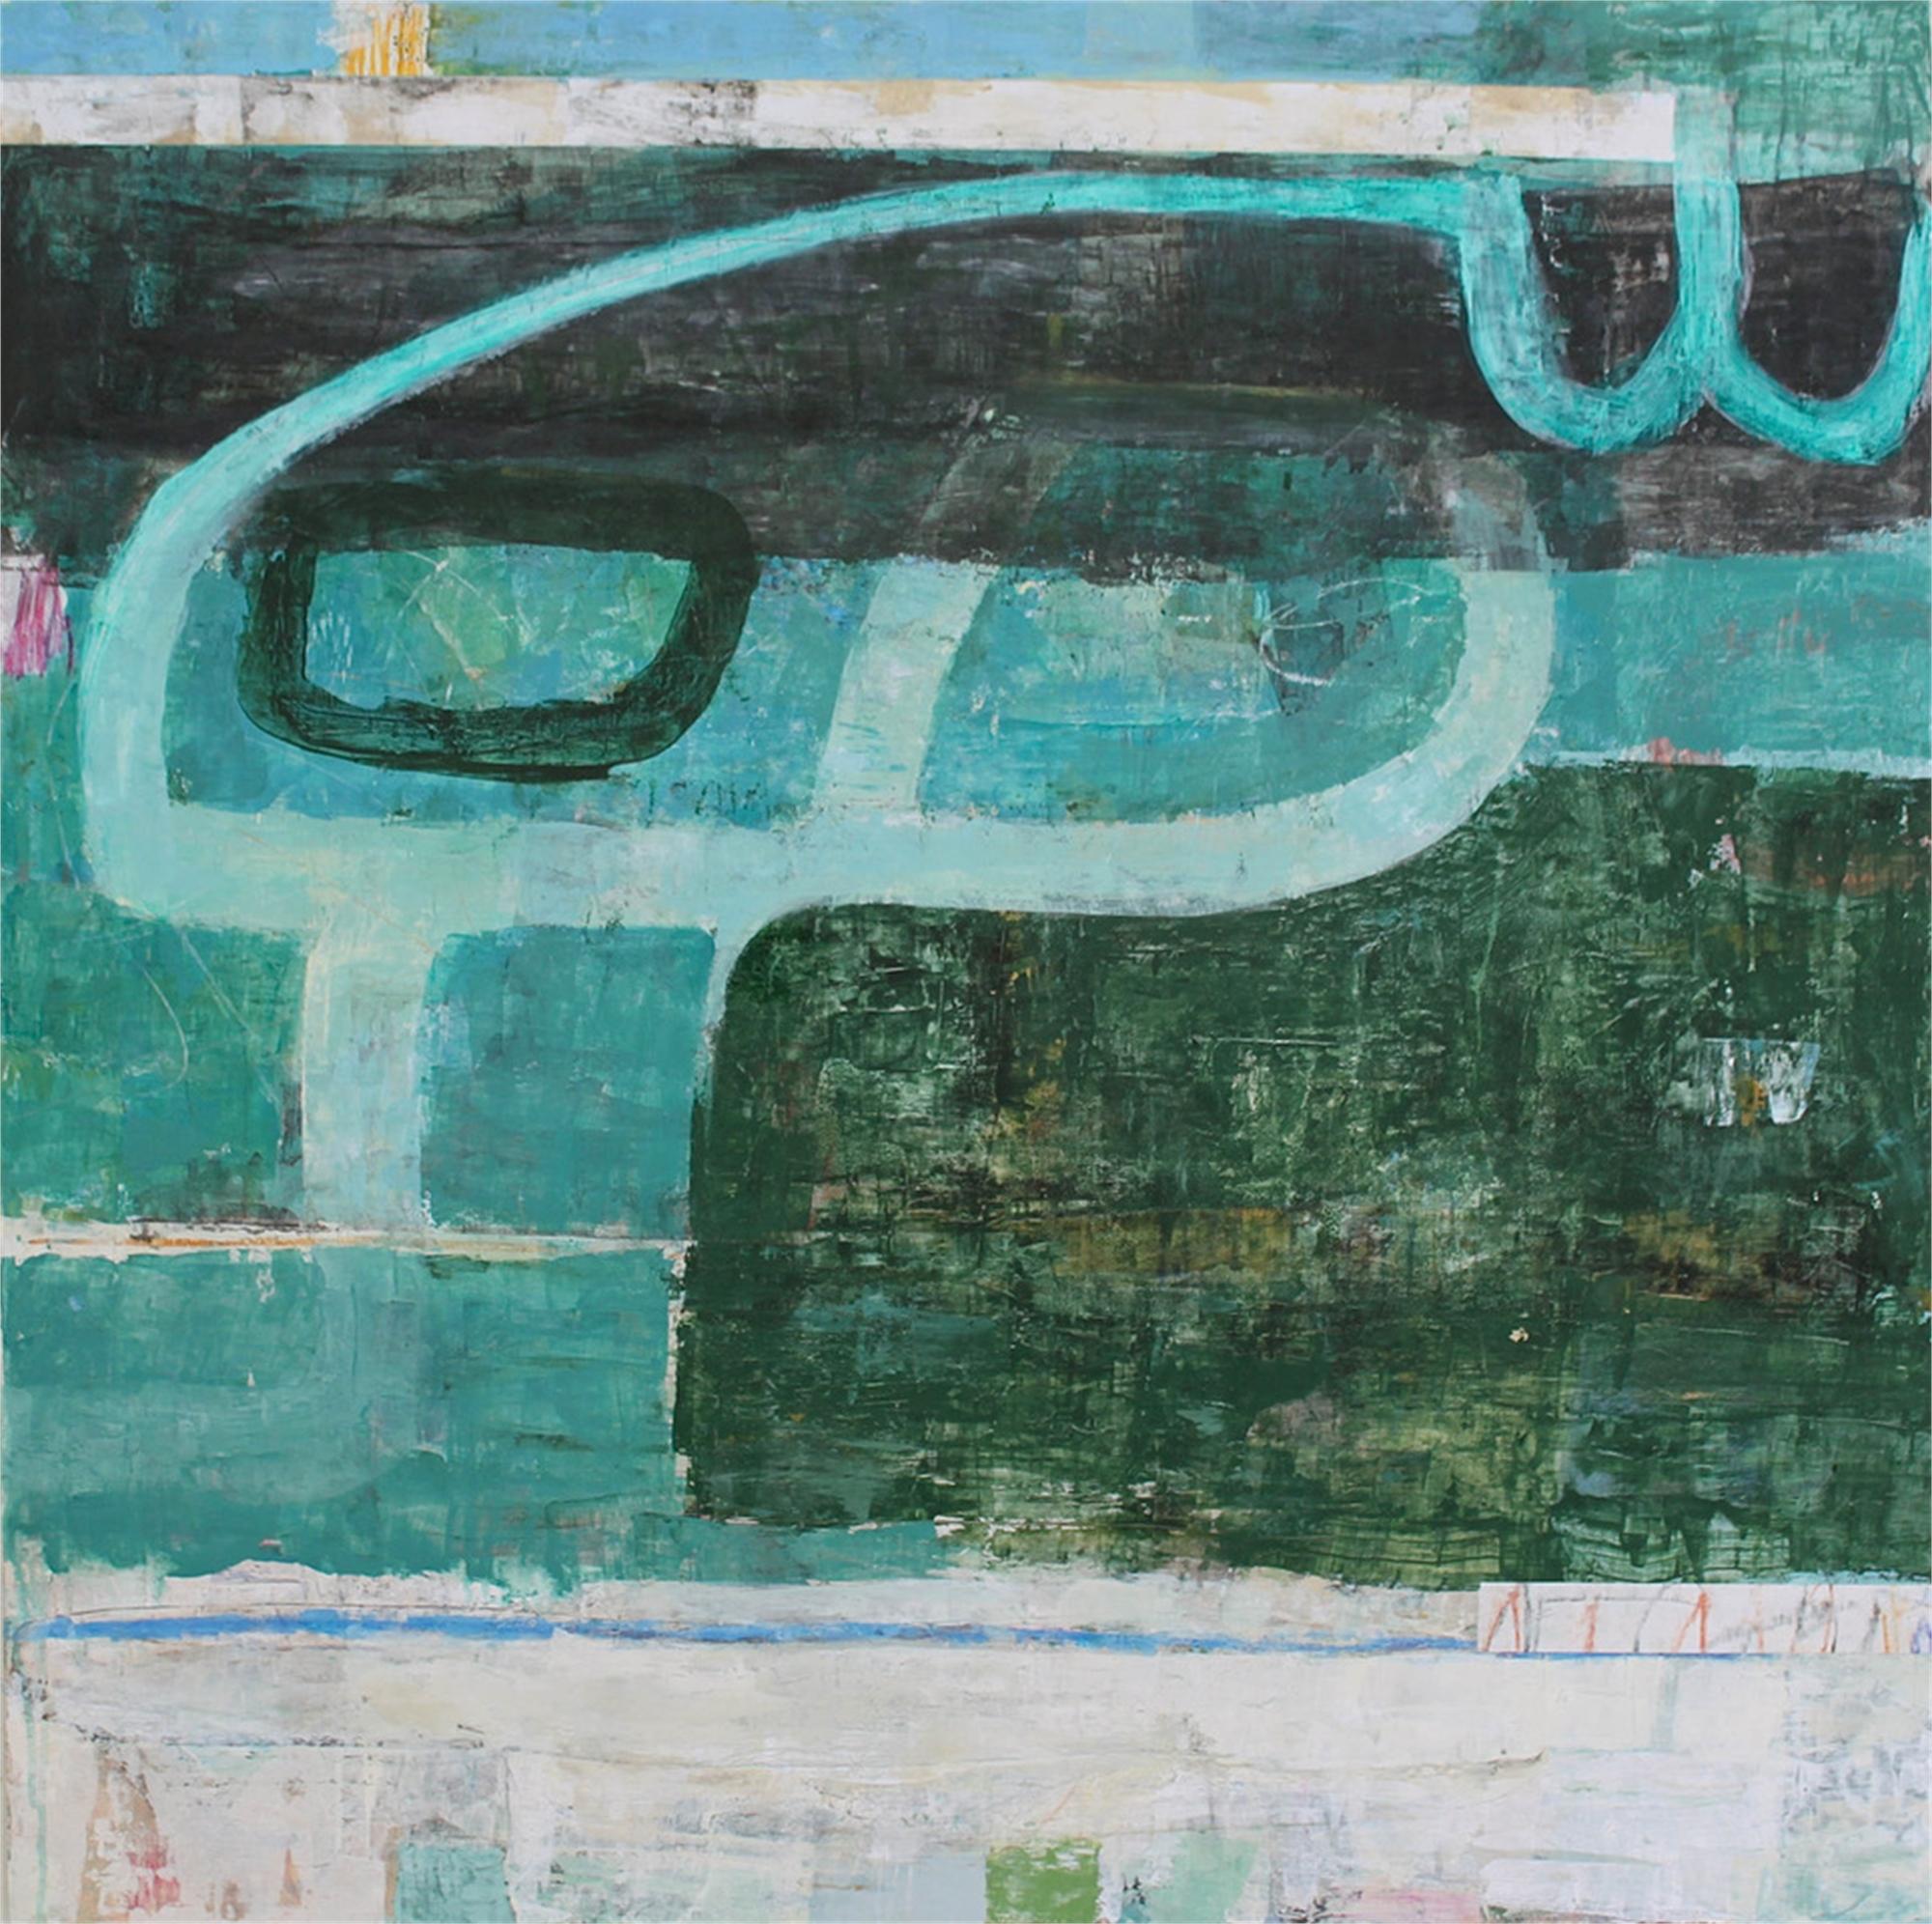 Tidal Track by Paul Brigham